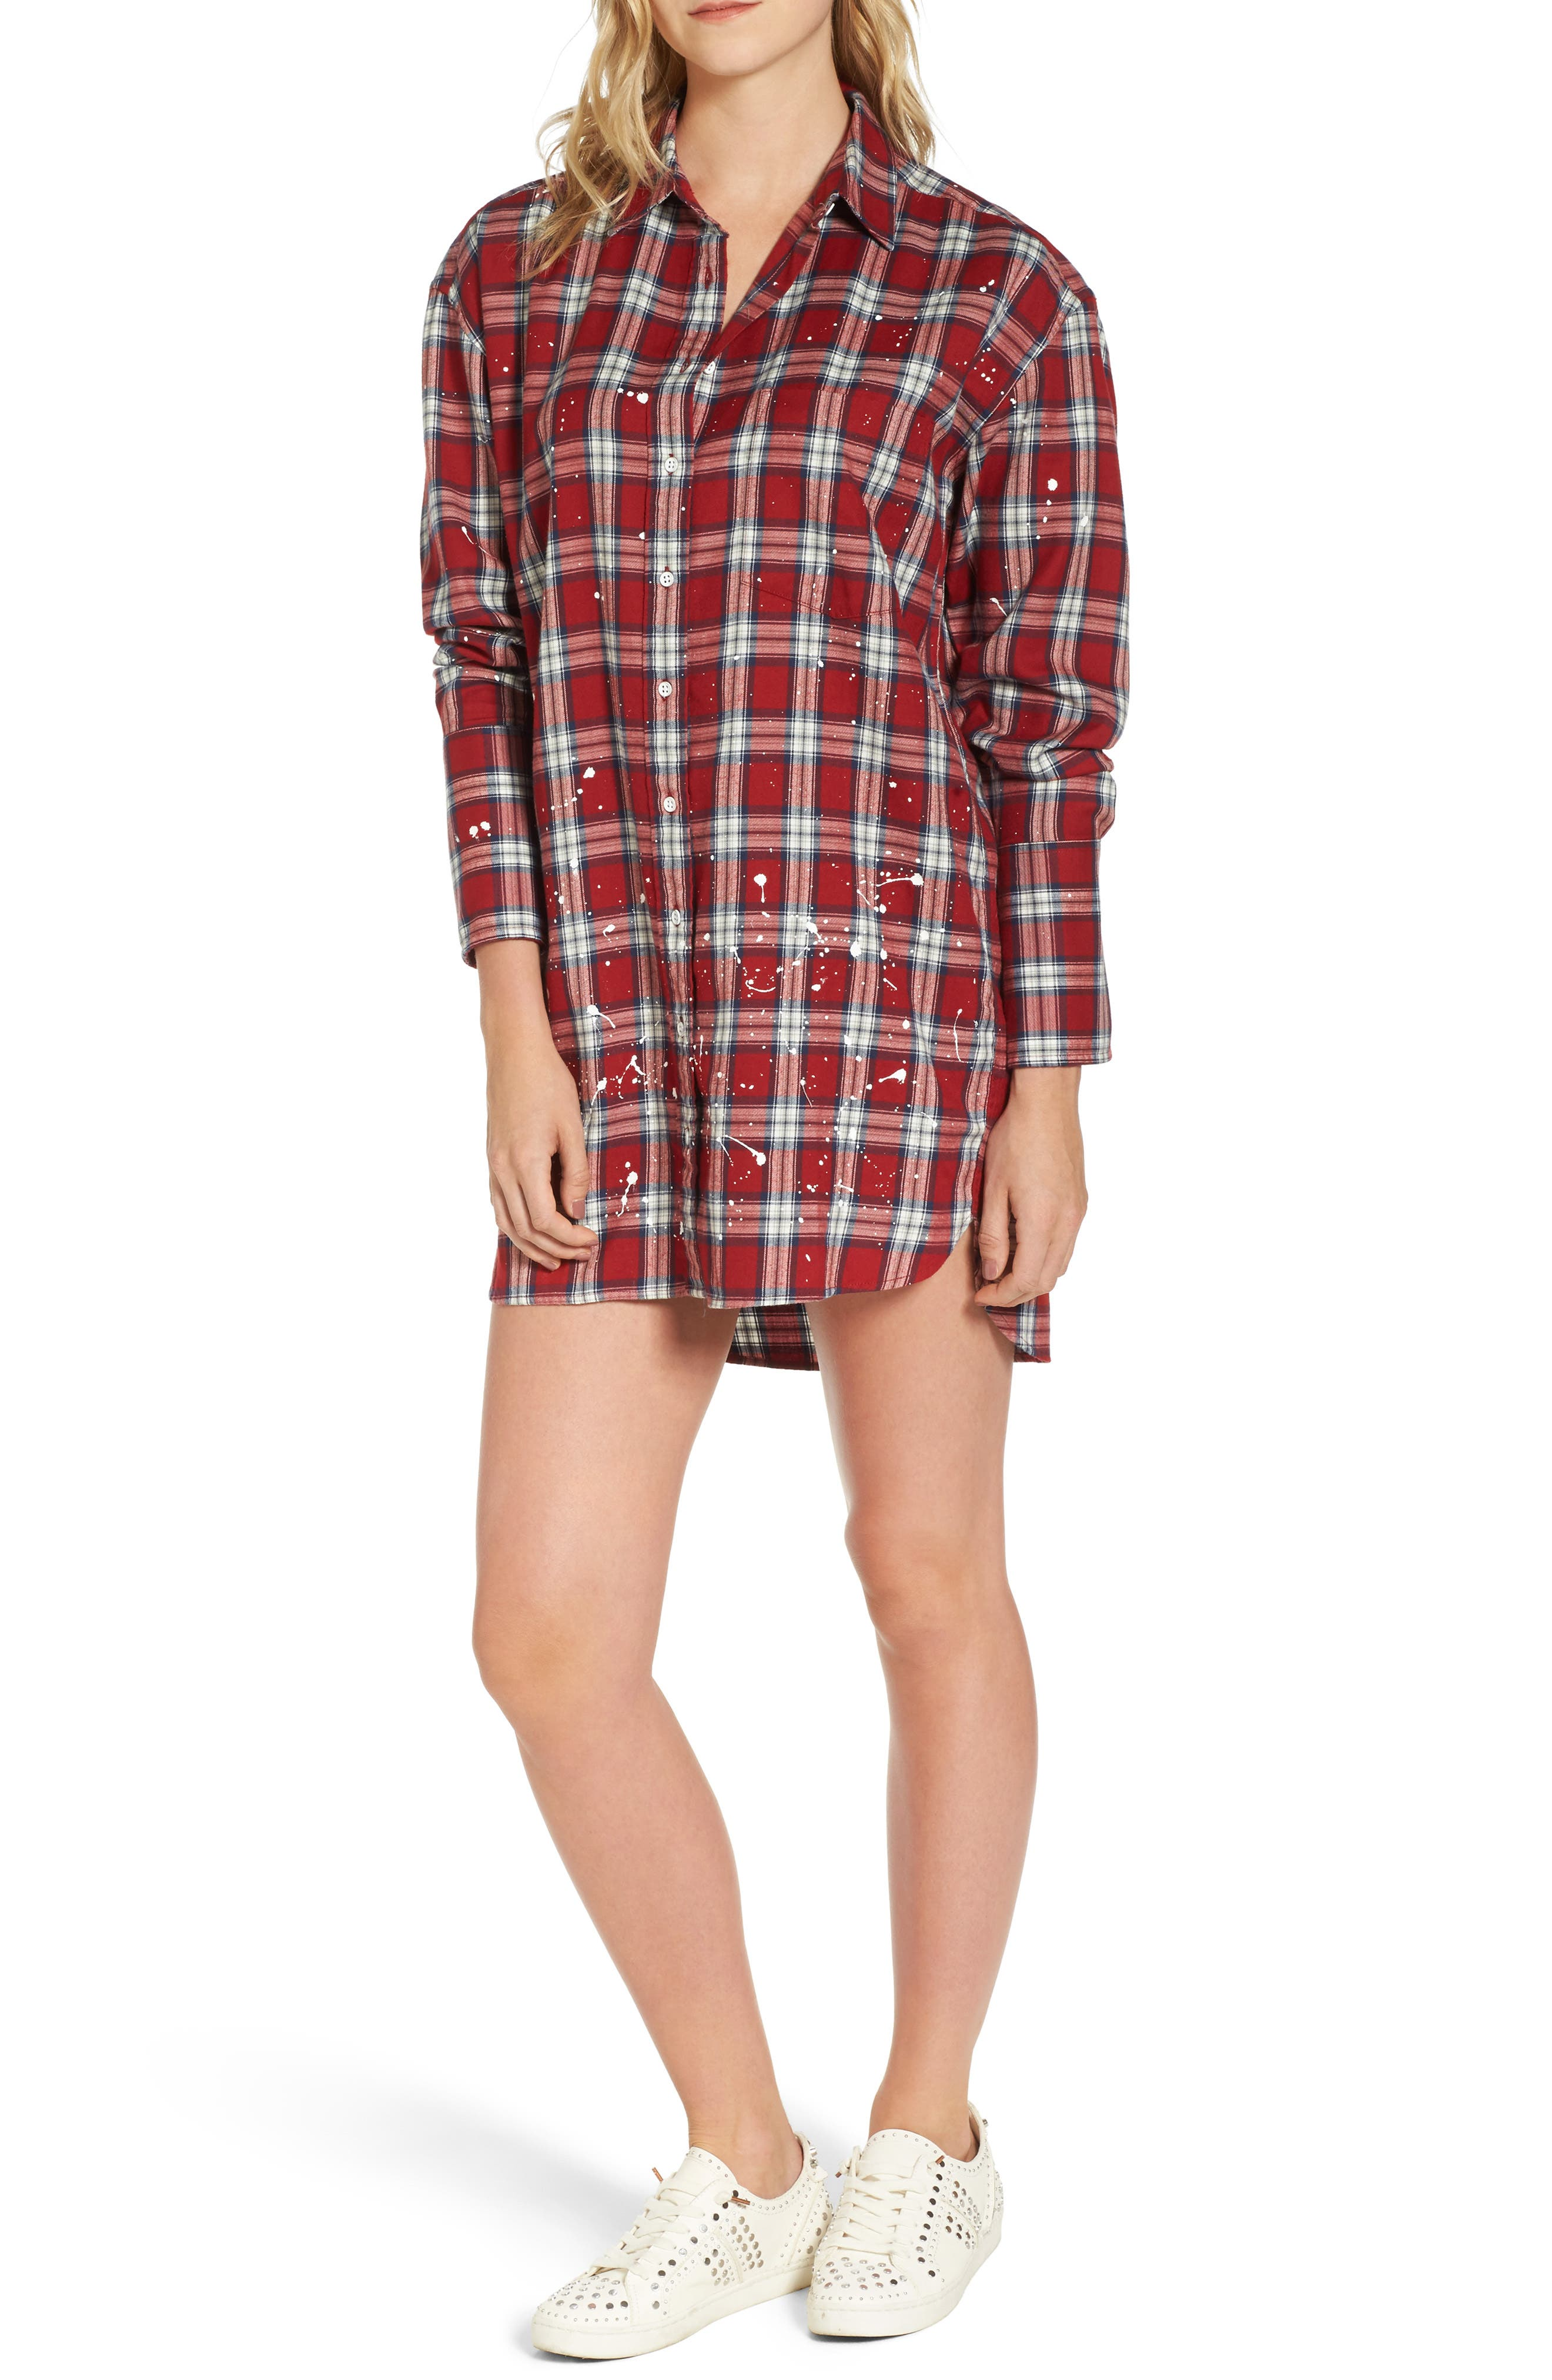 Rivington & Essex Plaid Shirtdress,                             Main thumbnail 1, color,                             609